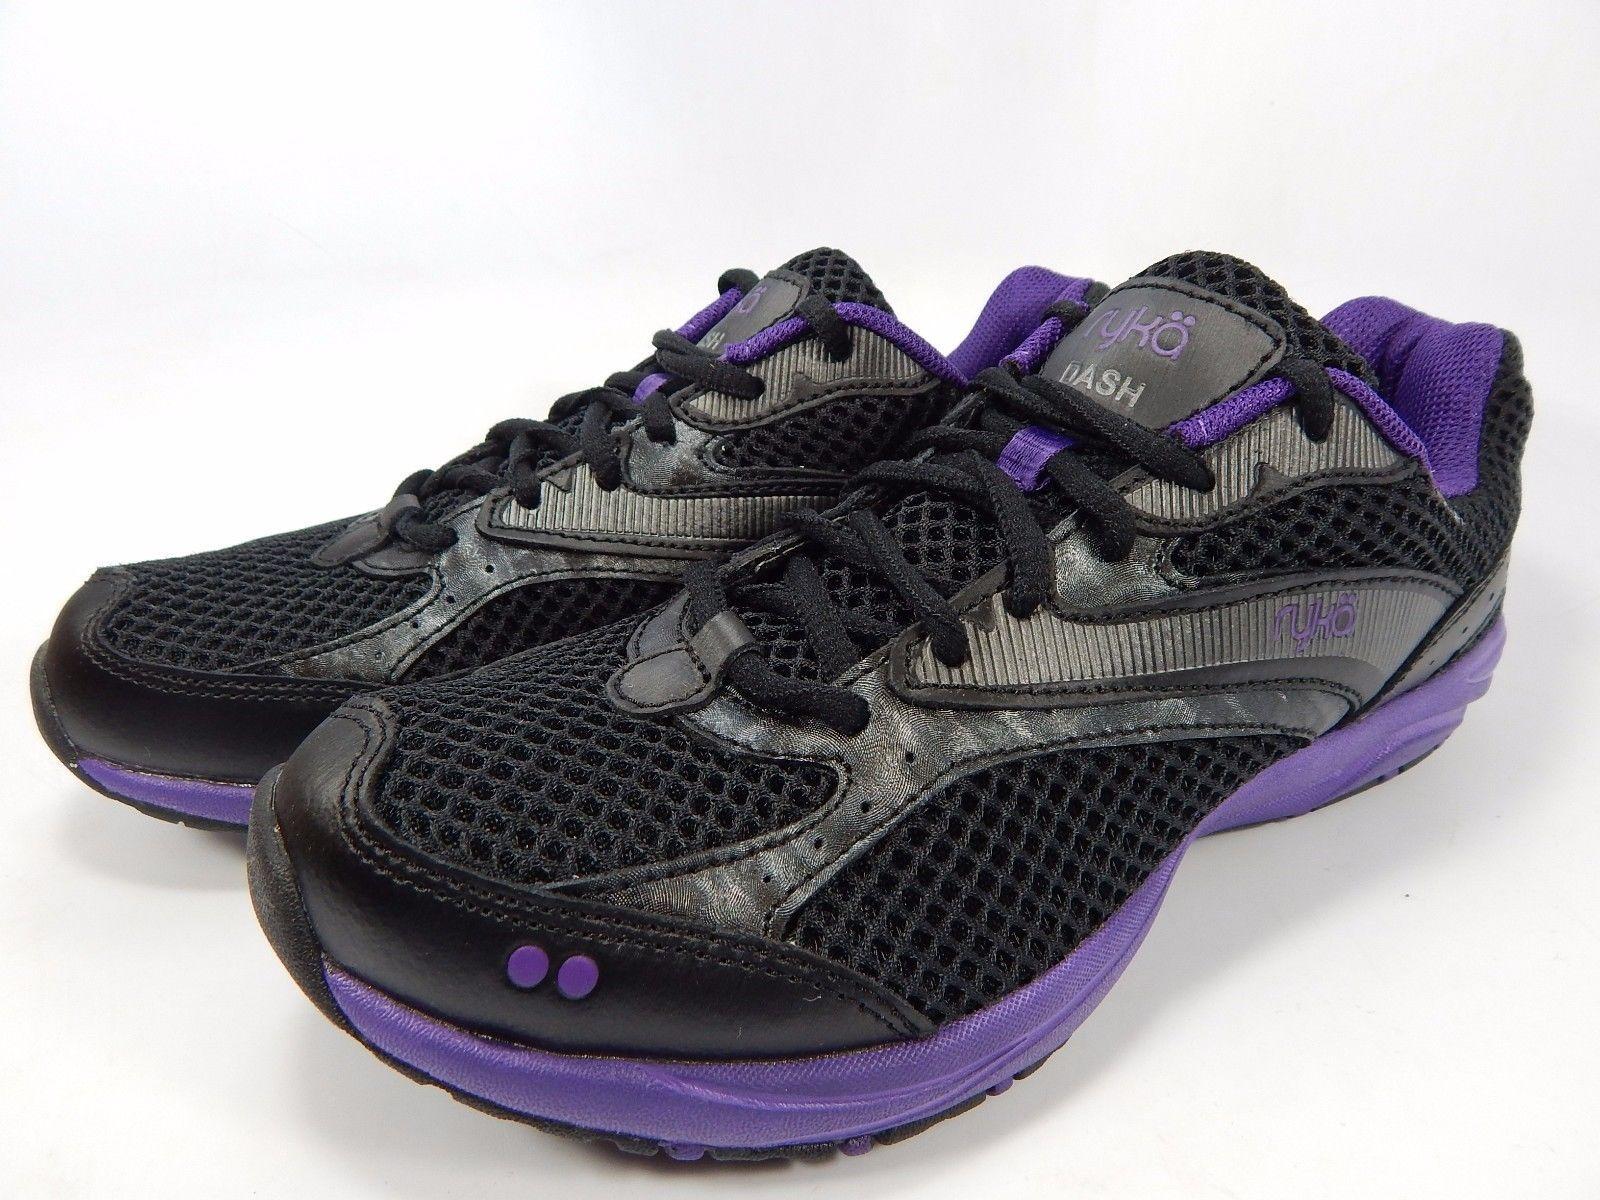 Ryka Dash Women's Running Shoes Size US 5.5 M (B) EU 35.5 Black Purple